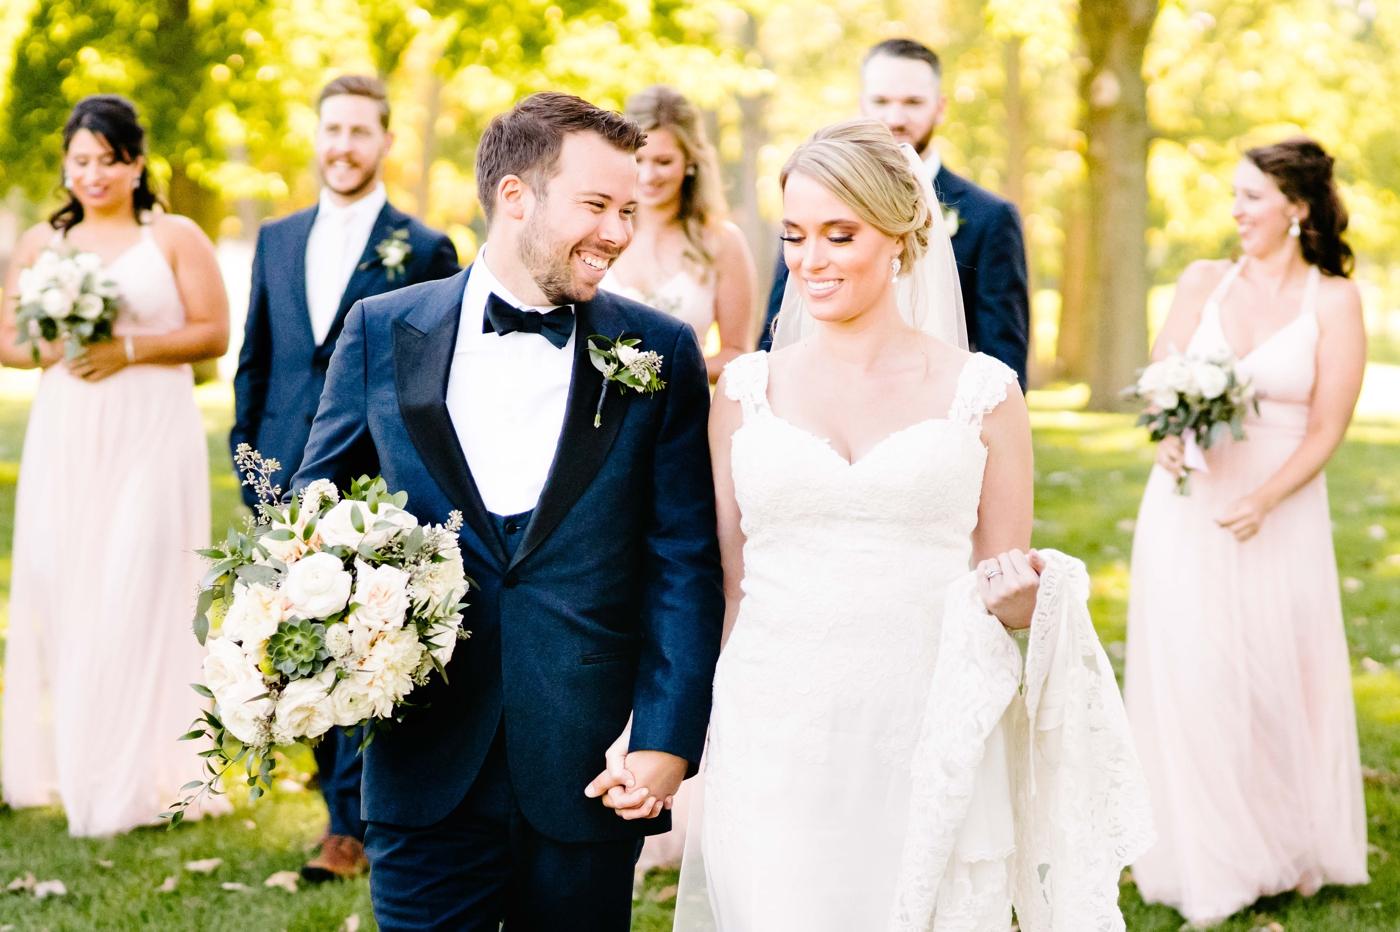 lake-geneva-fine-art-wedding-photography-mesley58